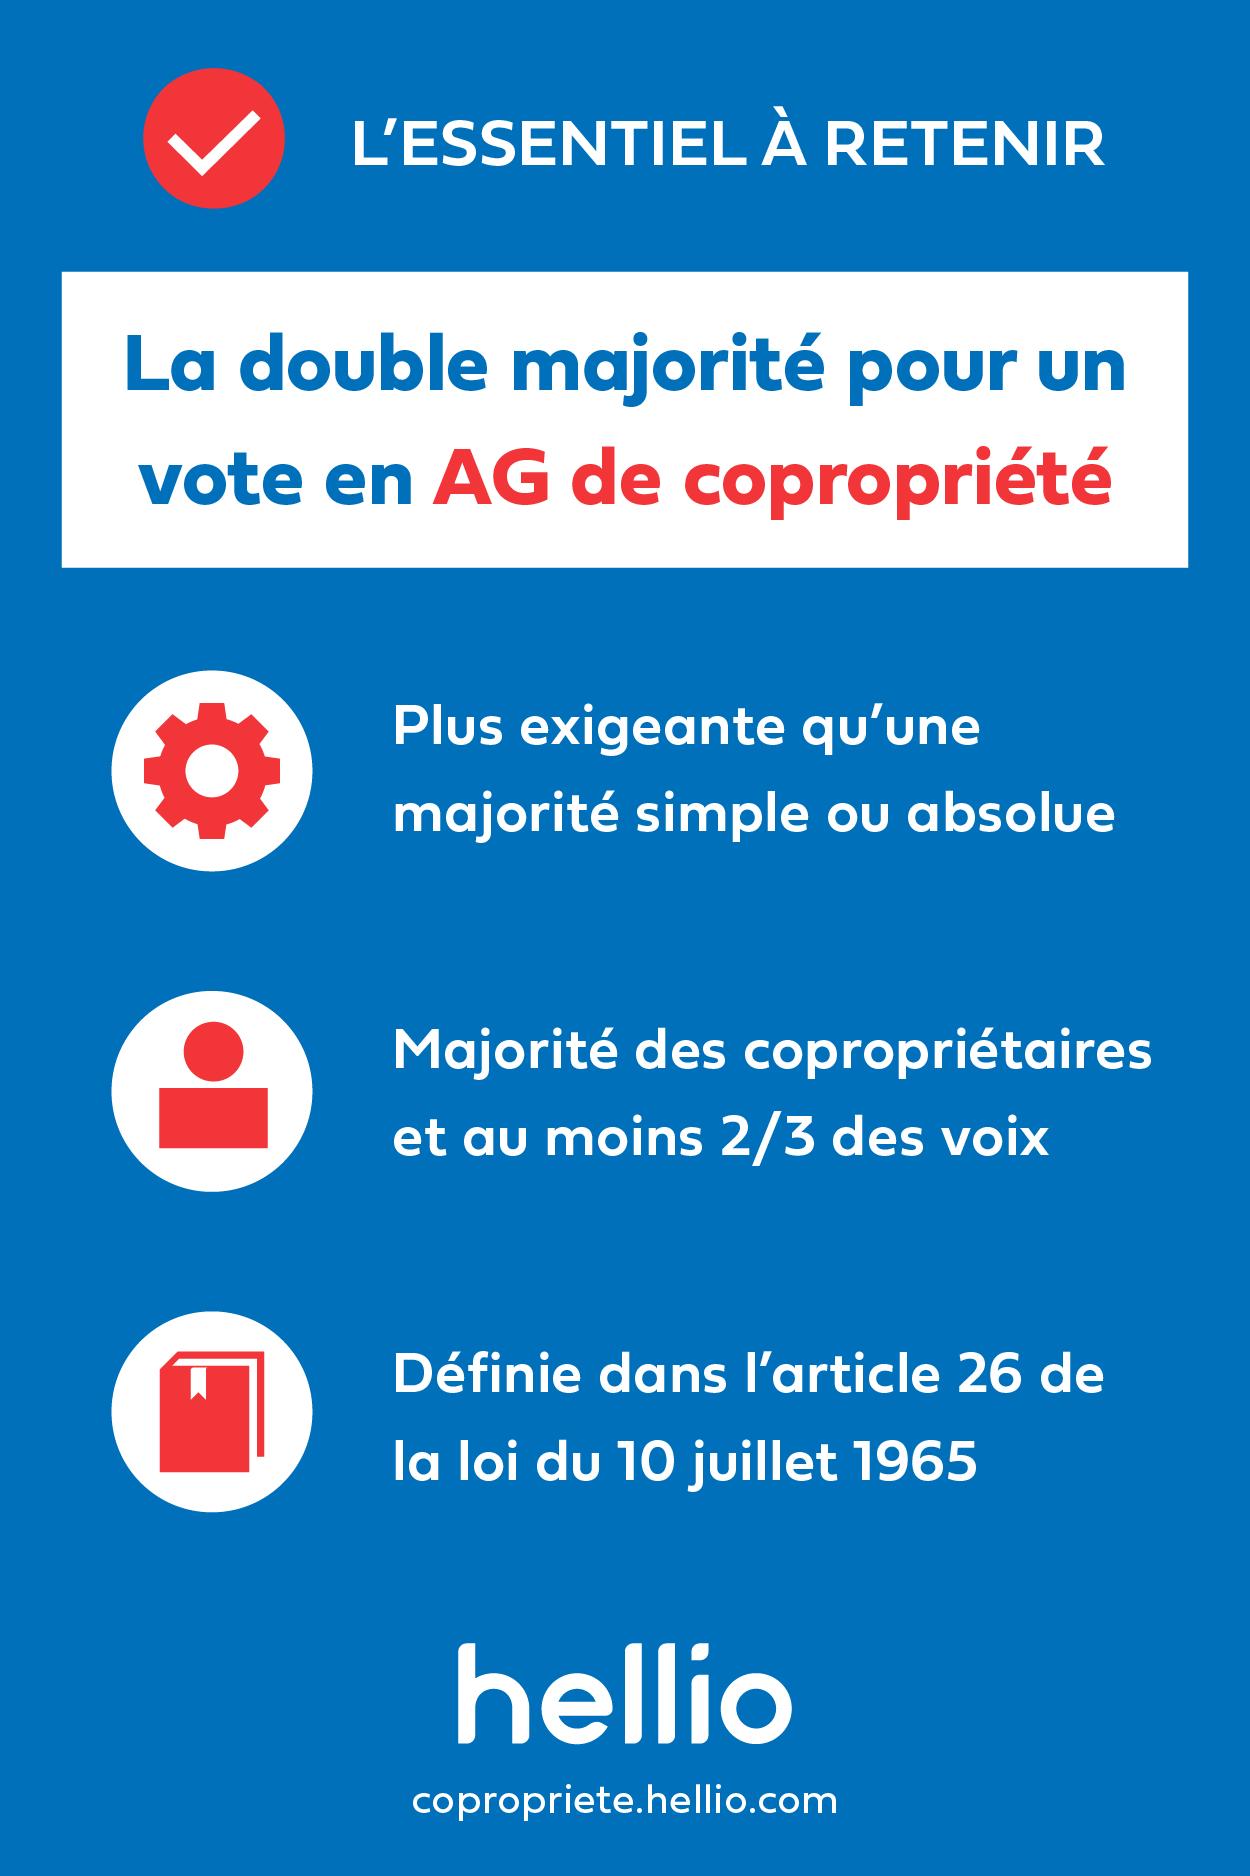 infographie-essentiel-retenir-hellio-copropriete-vote-copropriete-double-majorite